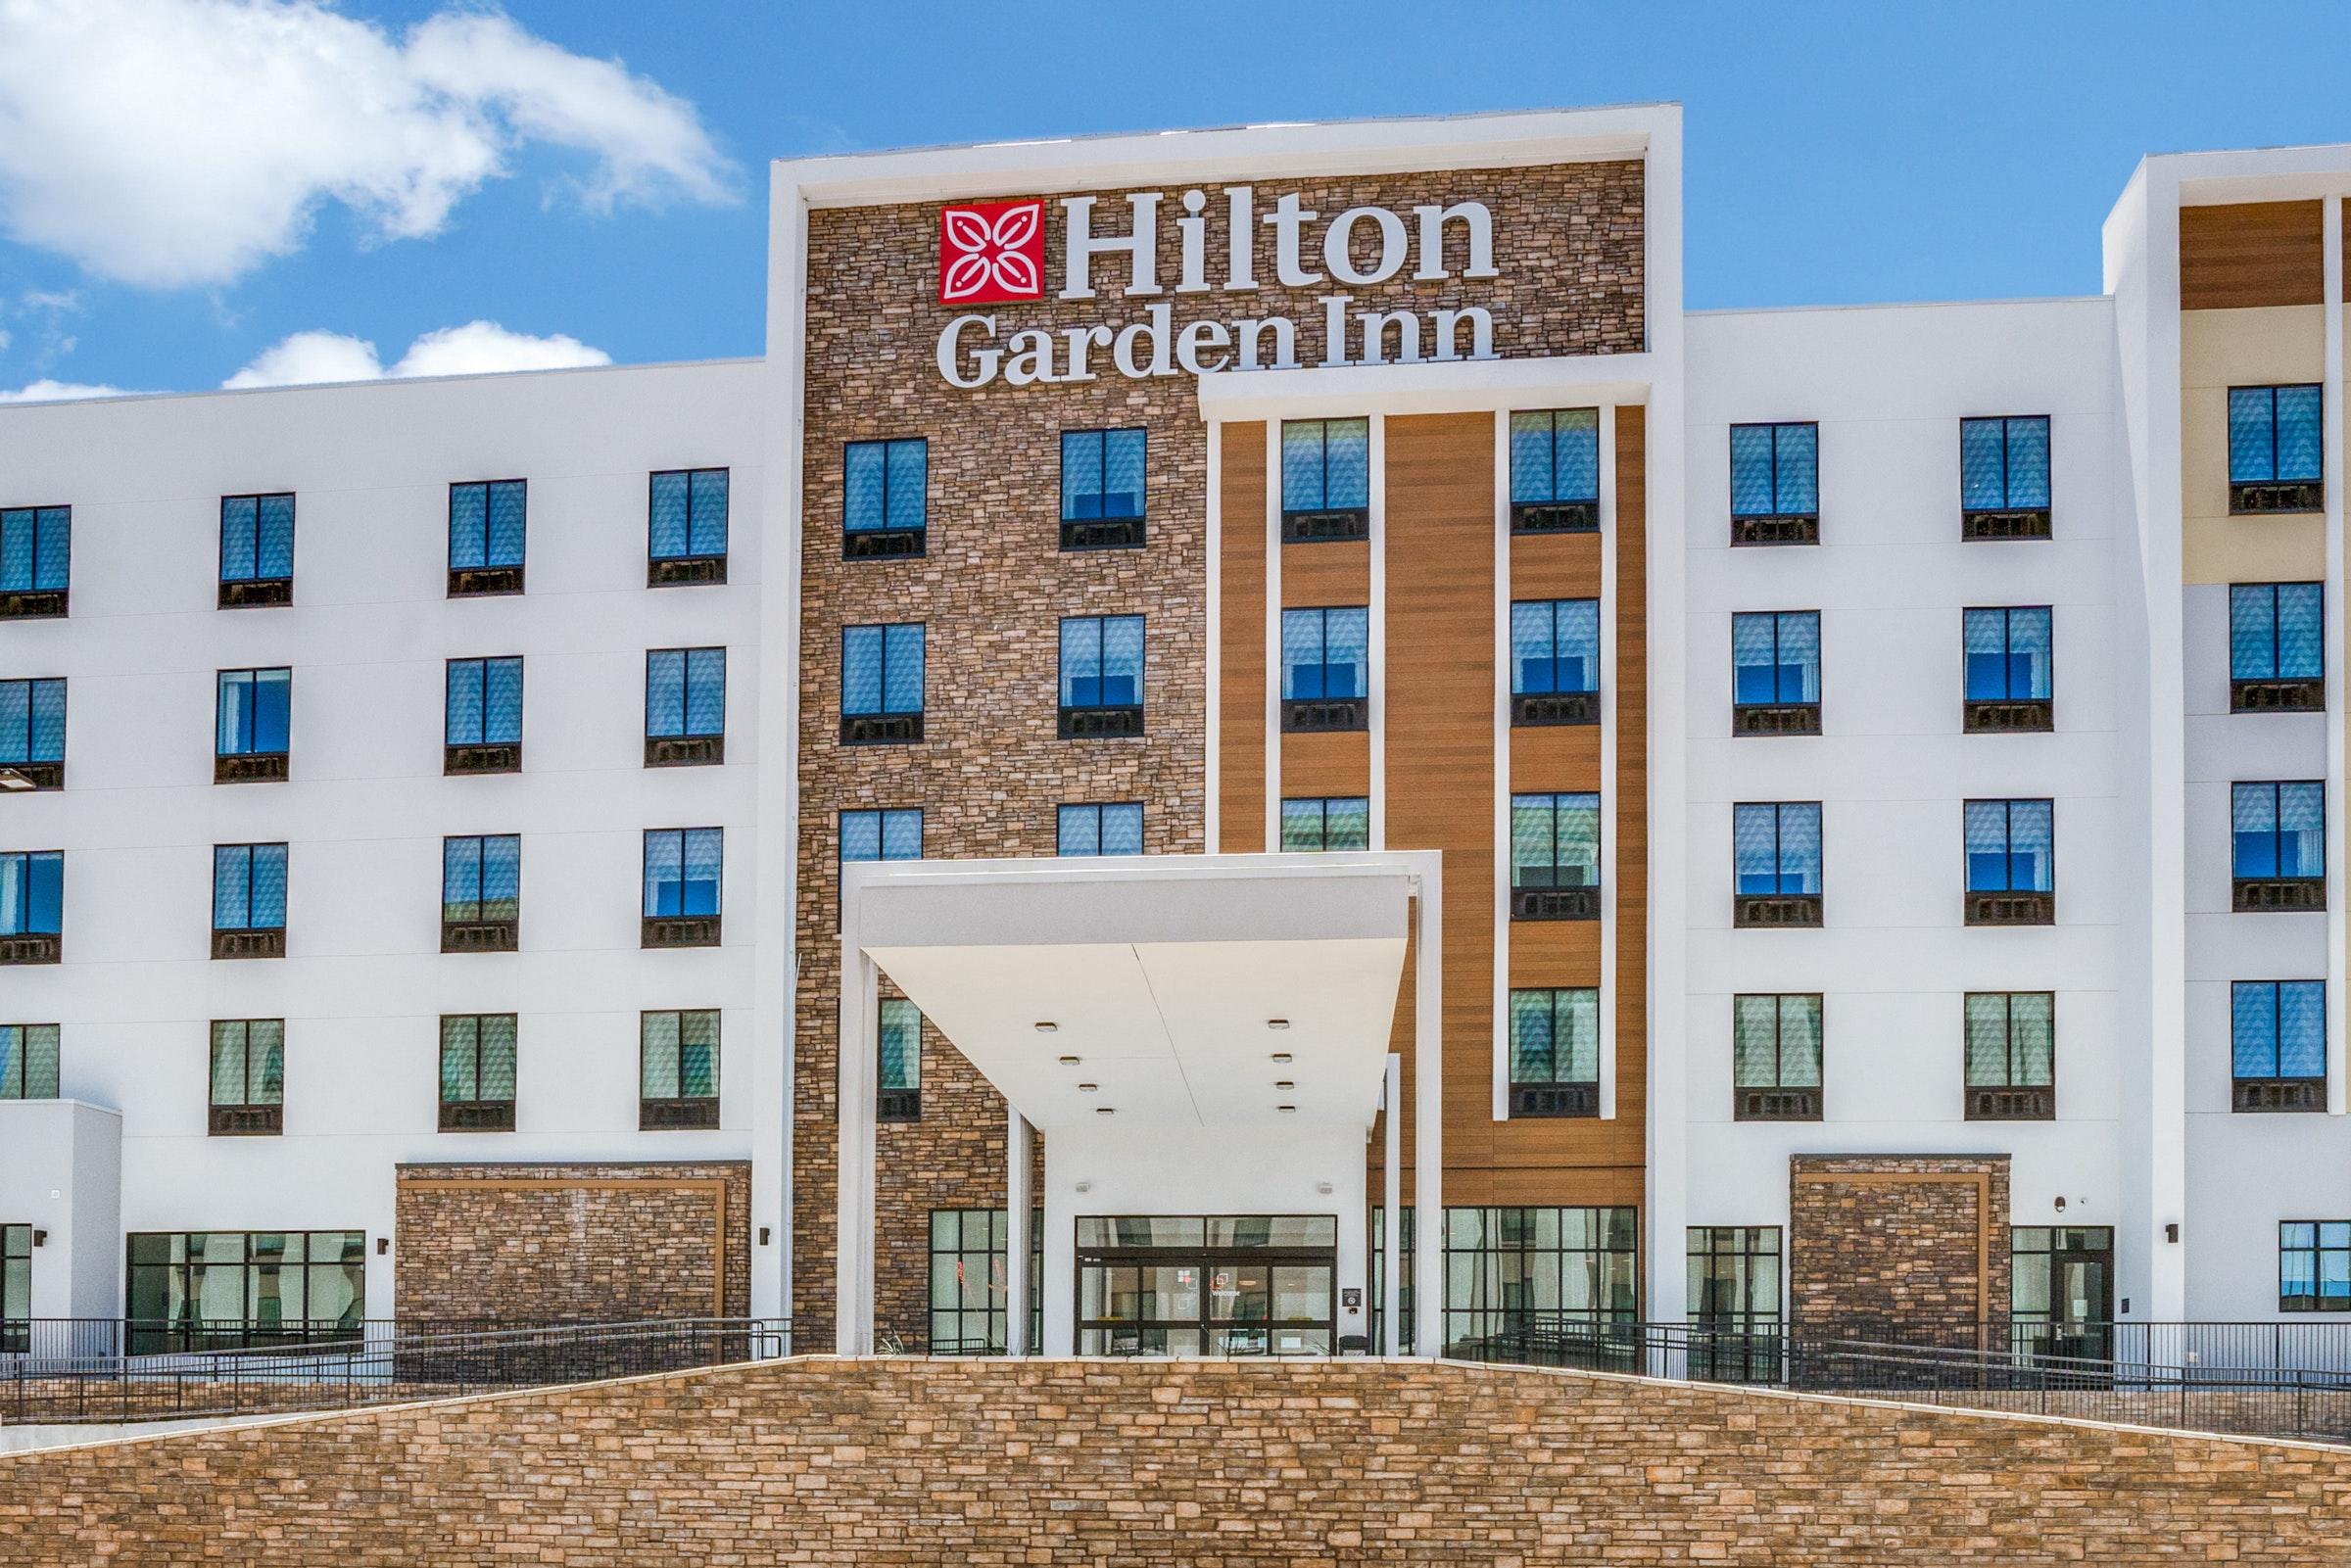 Hilton Garden Inn Dallas Central Expy/ NorthPark in Beyond Dallas